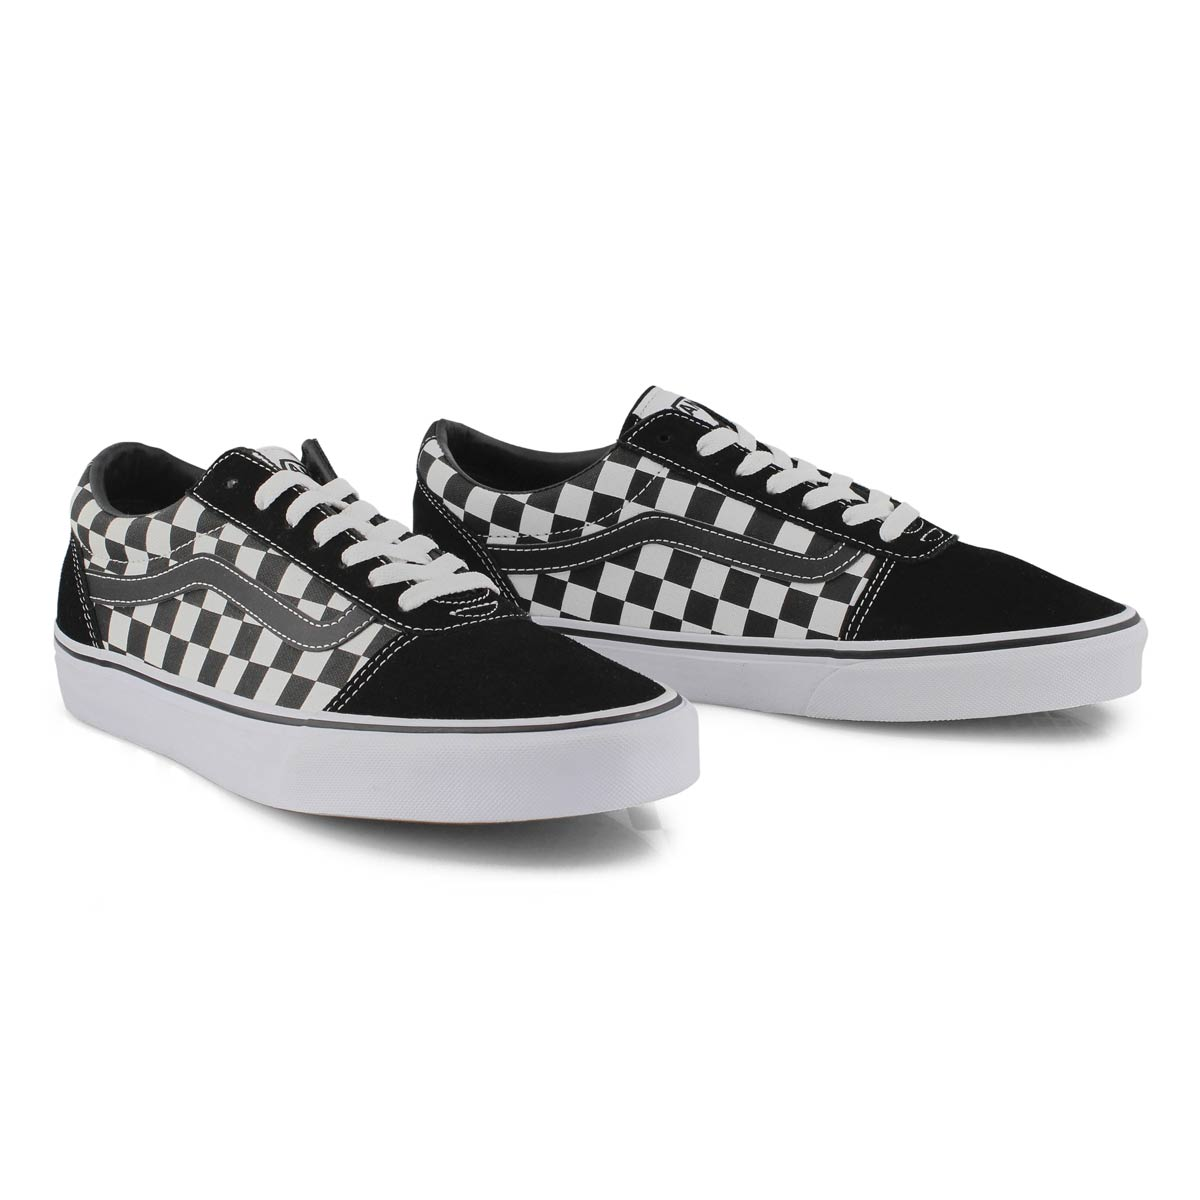 Men's Ward Sneaker - Checkered Black/White